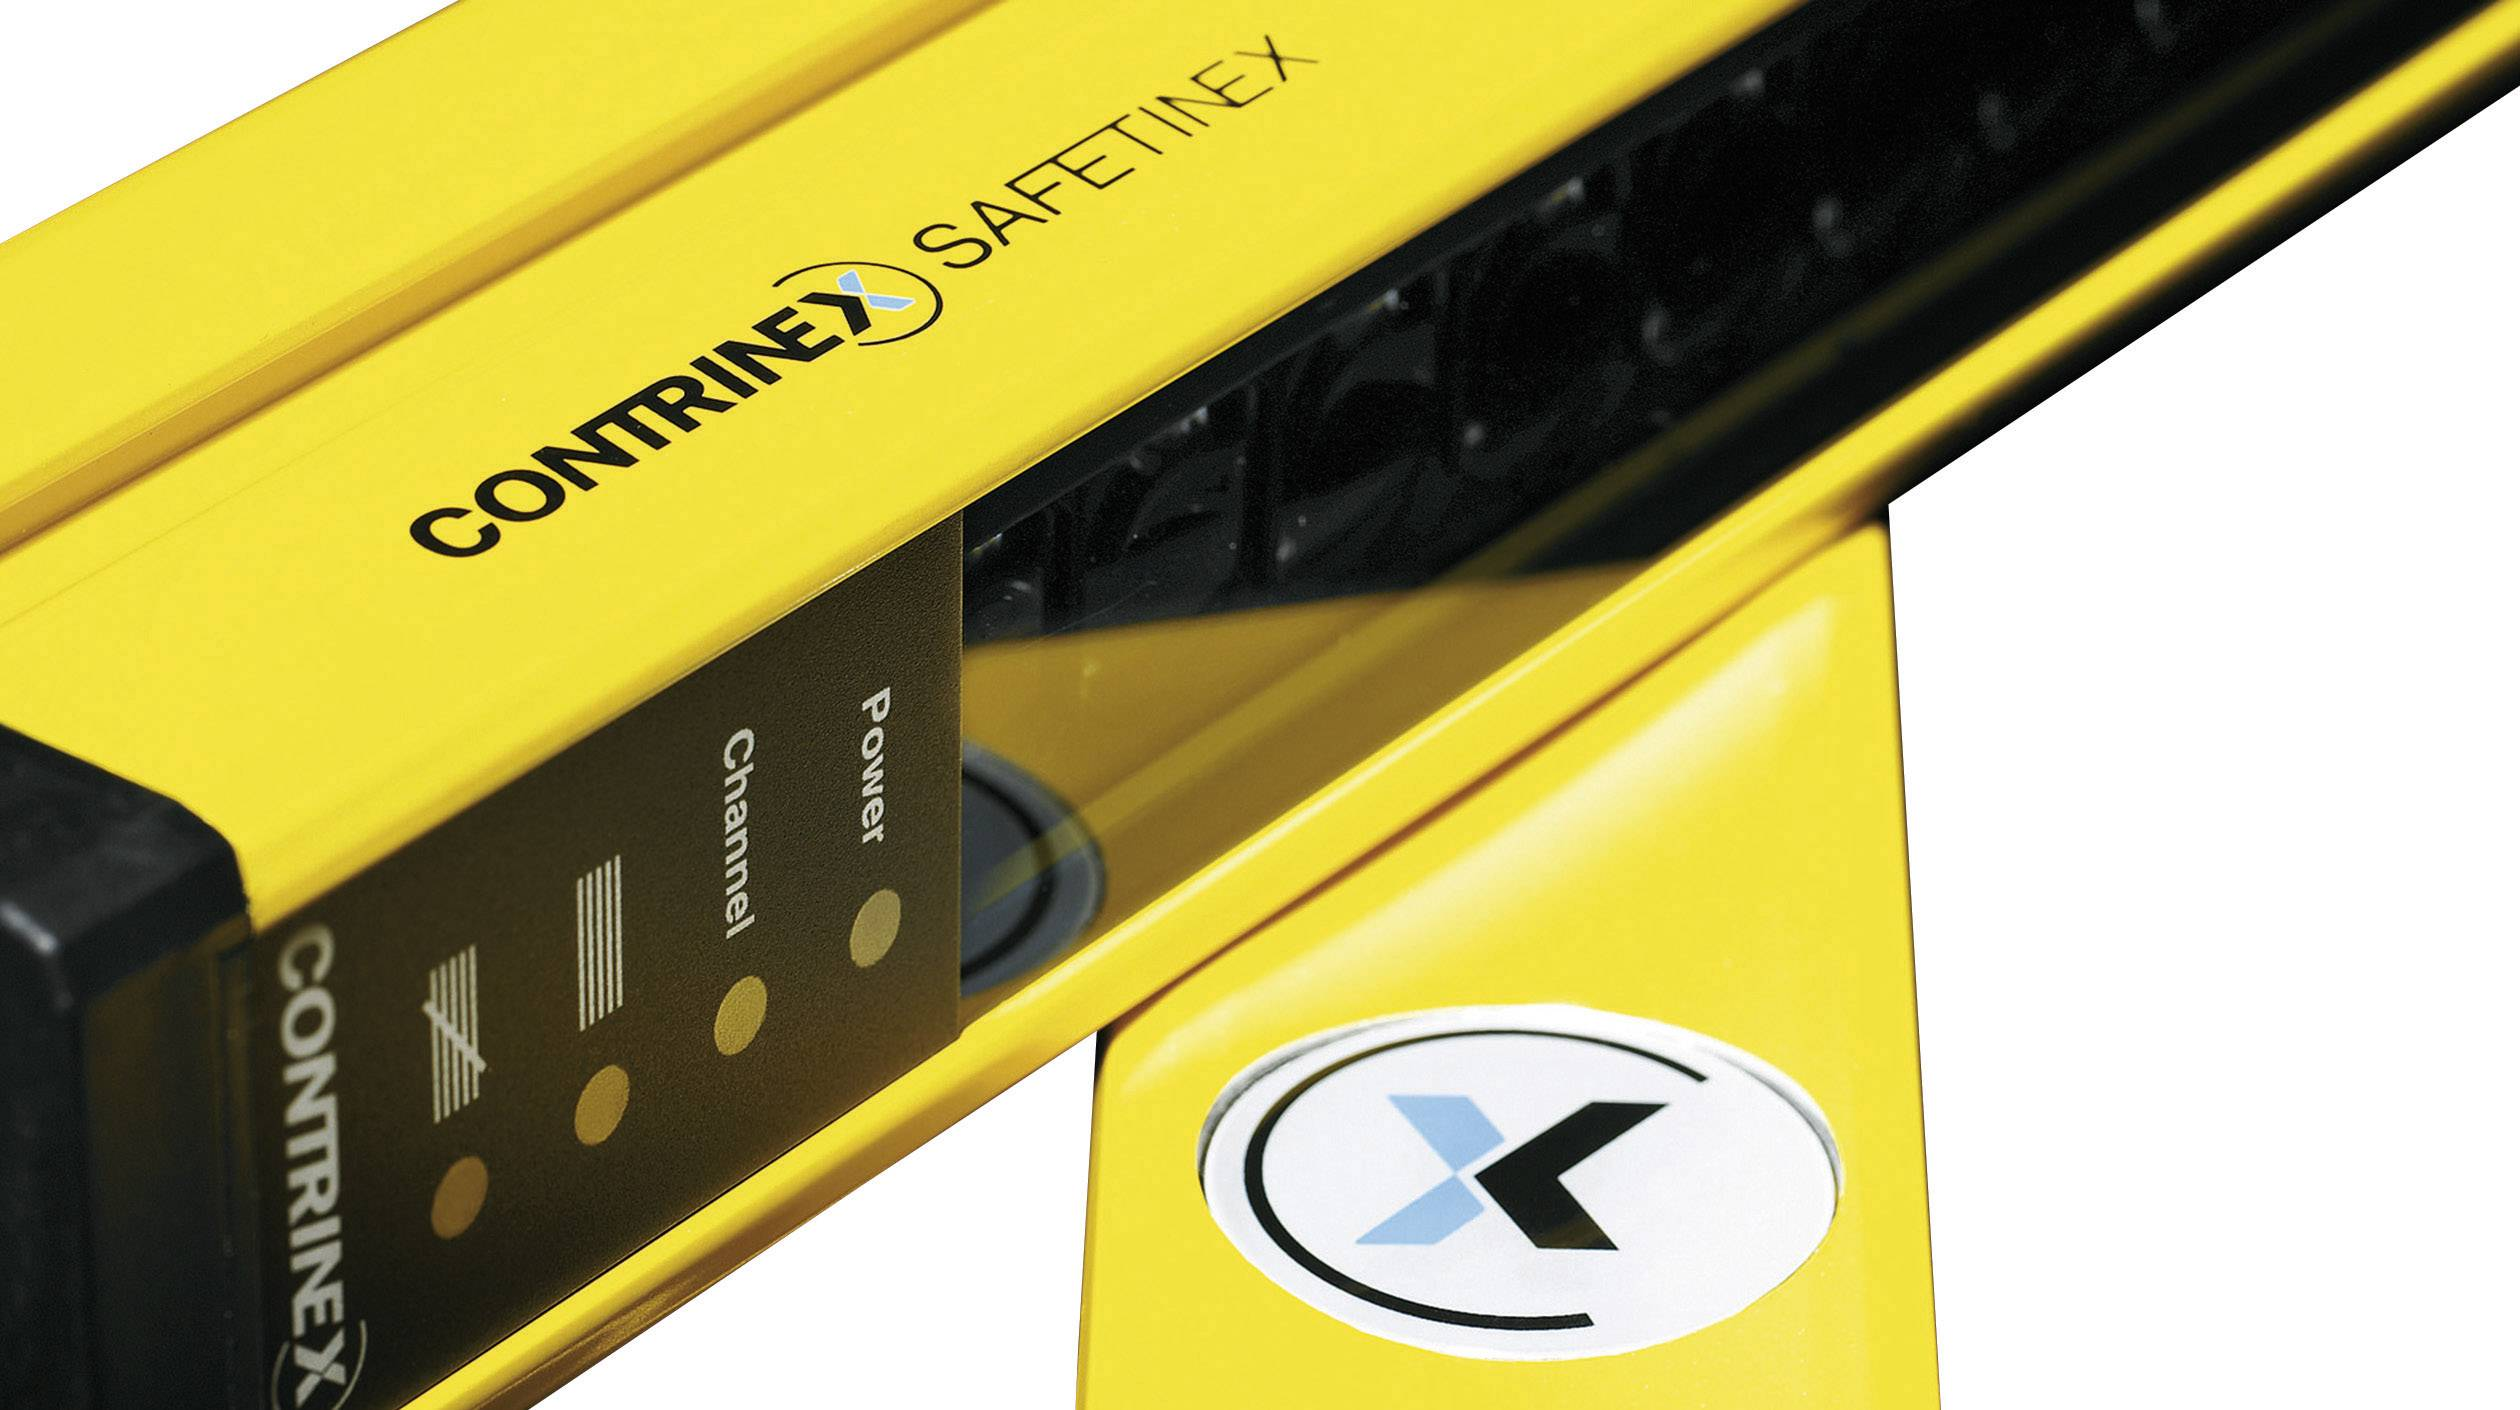 Contrinex YBB-14R4-1000-G012 630 000 181